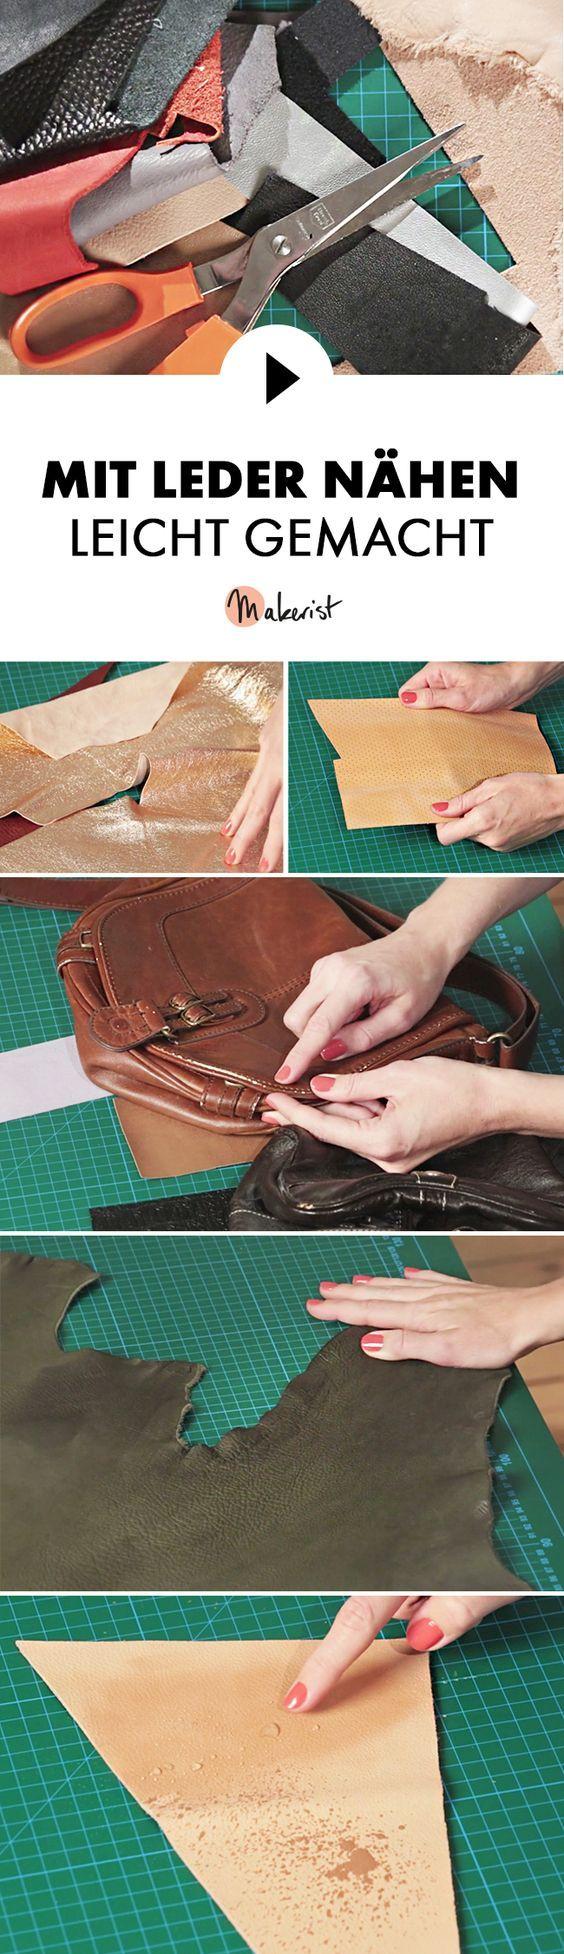 Tipps zum Nähen mit Leder – Nähtipps via Makerist.de Stricki